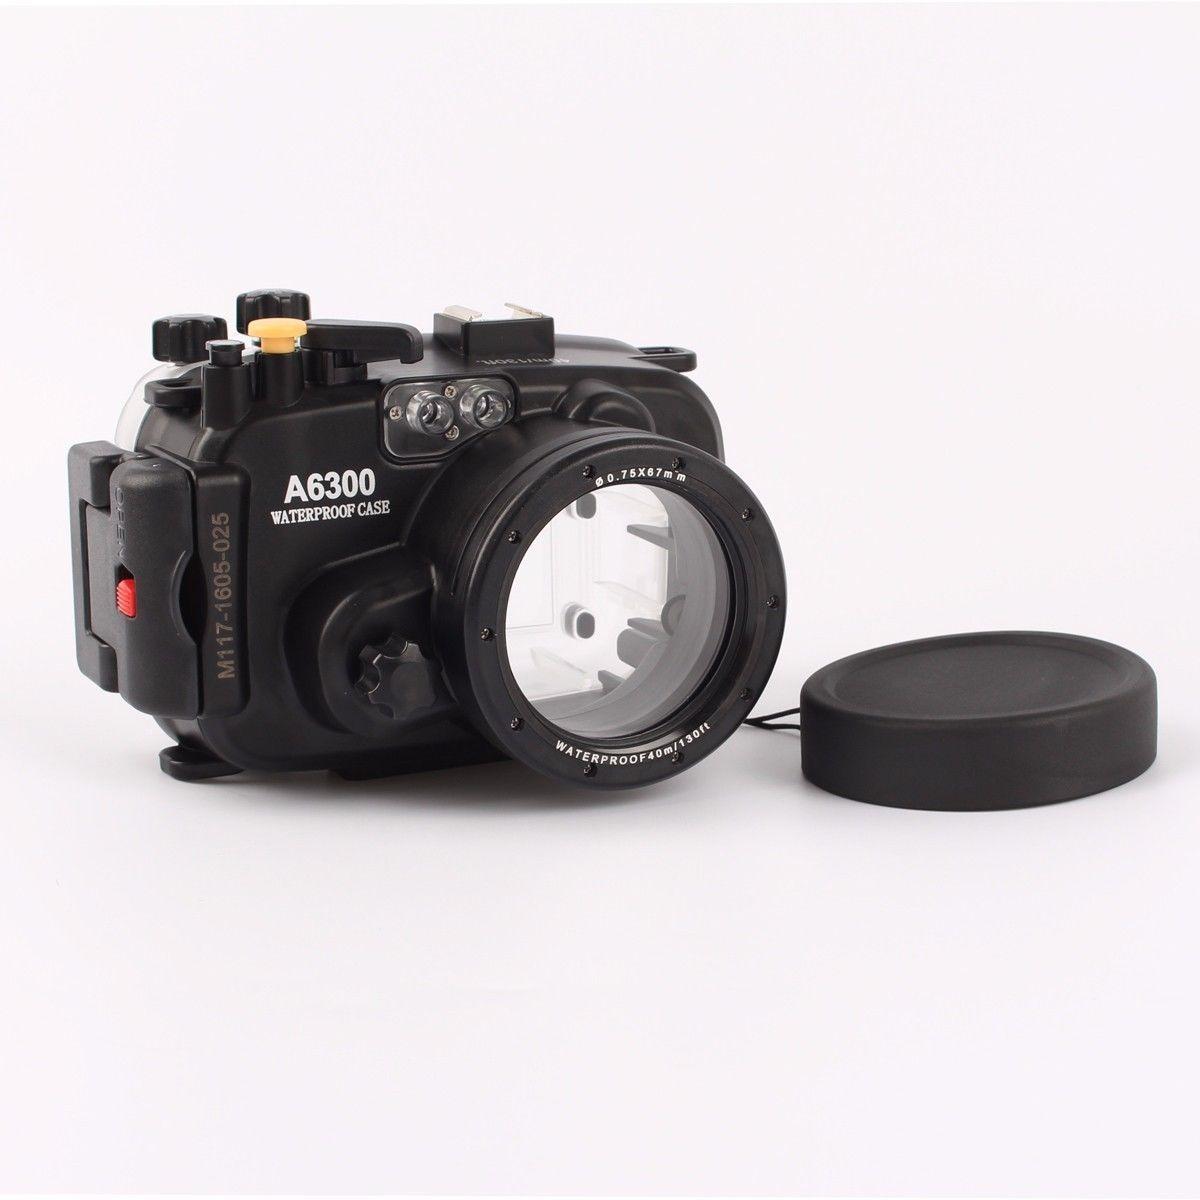 diving Waterproof Underwater Housing Camera bag Case+ Red Filter for Sony A6300 16-50mm Lens waterproof underwater housing camera bag case for sony a6000 16 50mm lens